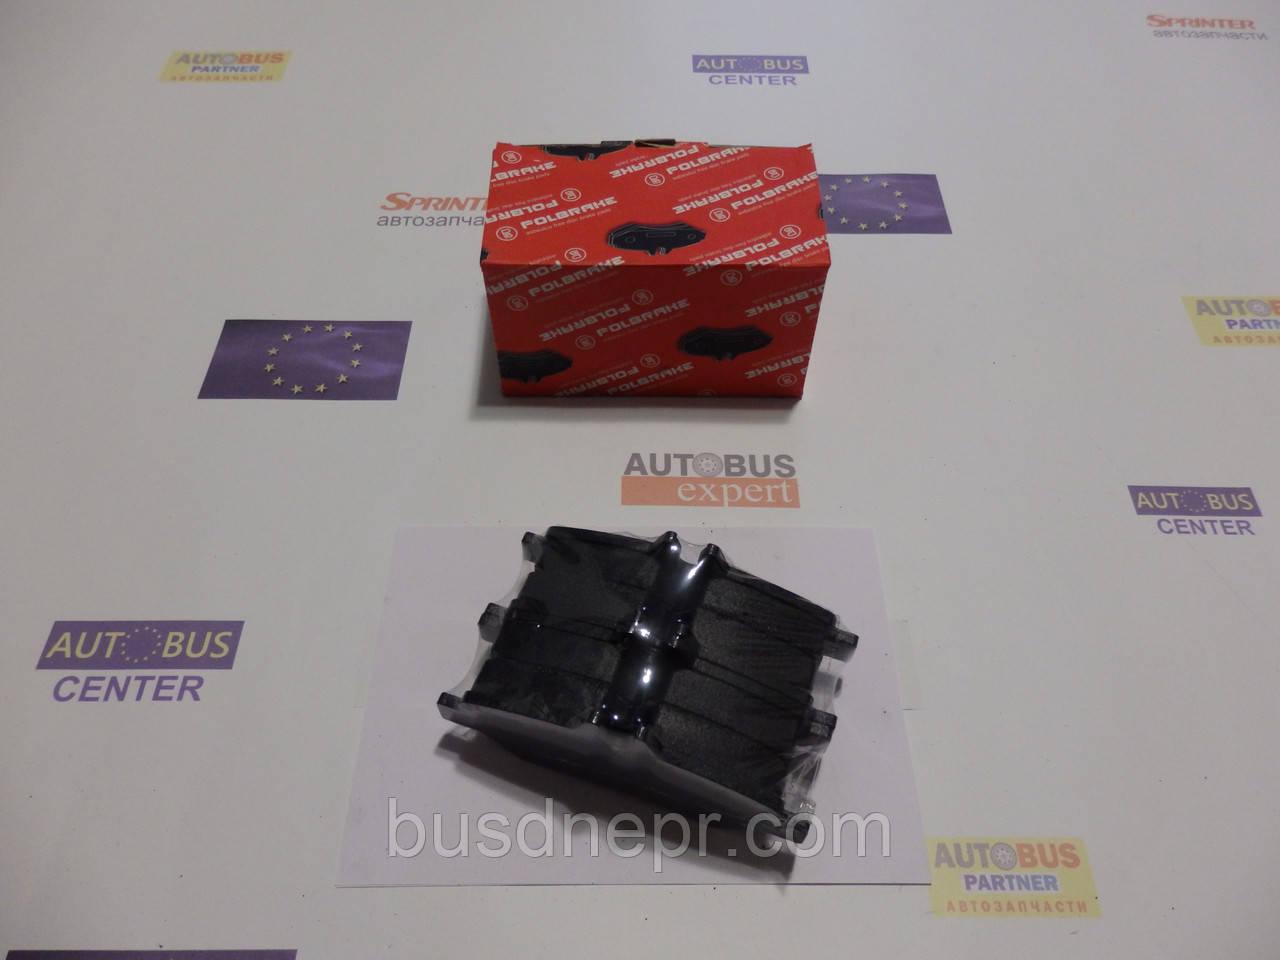 Тормозные колодки, задние (не спарка), MB Sprinter, VW Crafter 06- POLBRAKE PB29190